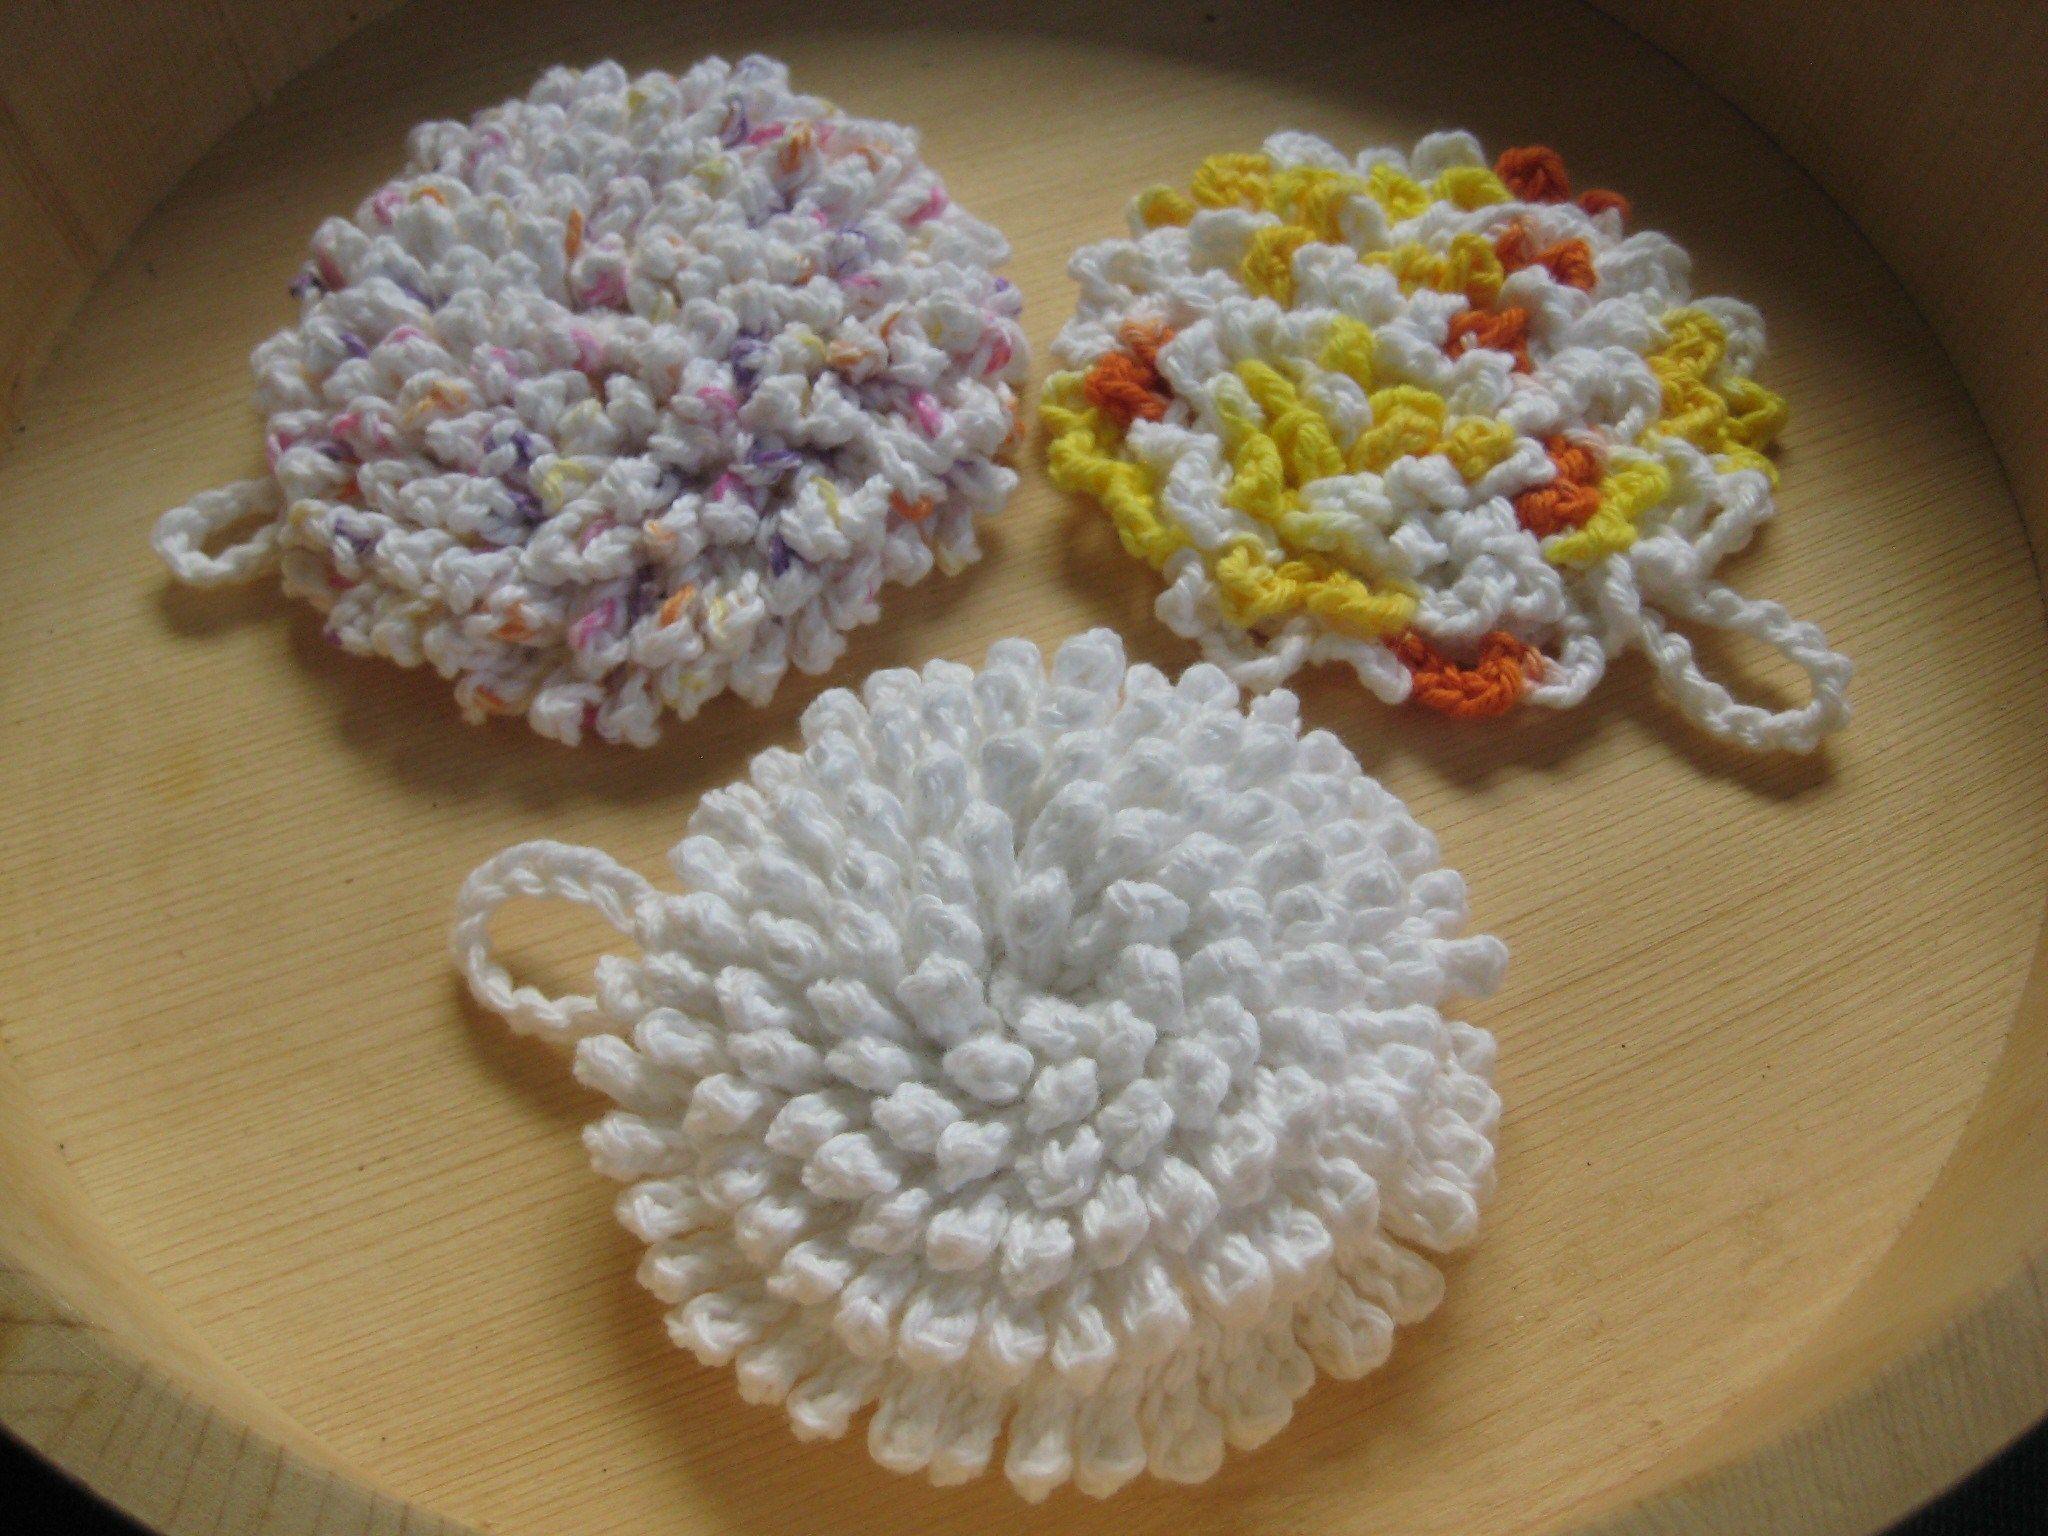 Ultra nubby scrubby tawashi crochet dish cloth pattern for sale ultra nubby scrubby tawashi crochet dish cloth pattern for sale at ravelry bankloansurffo Gallery